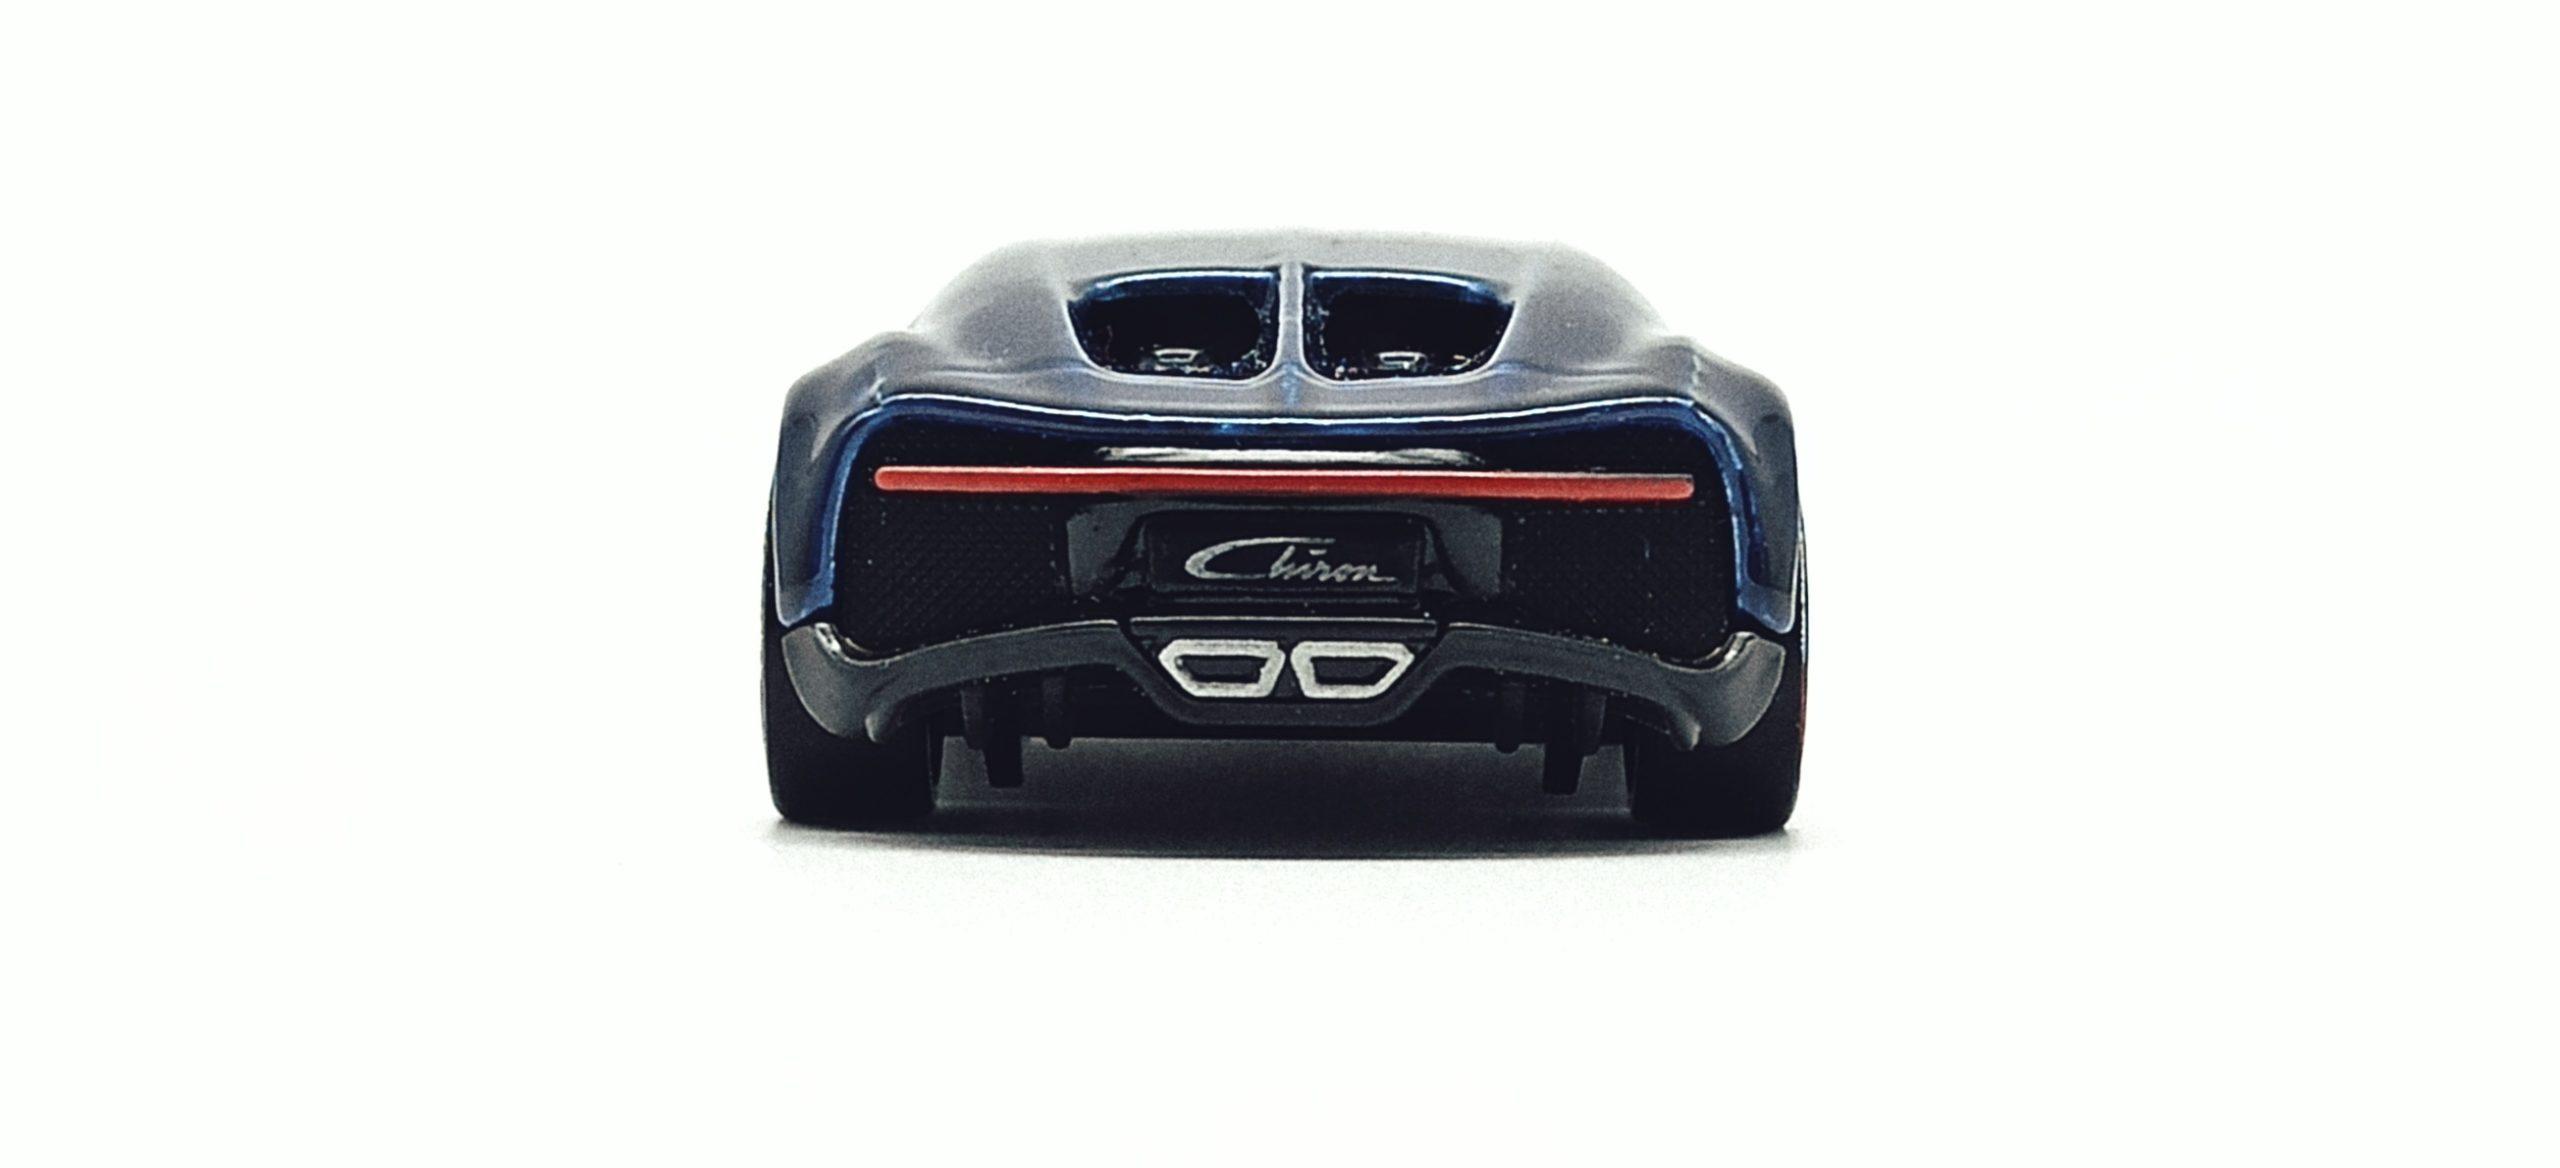 Hot Wheels id '16 Bugatti Chiron (HBG00) 2021 HW Turbo (3/4) spectraflame blue back